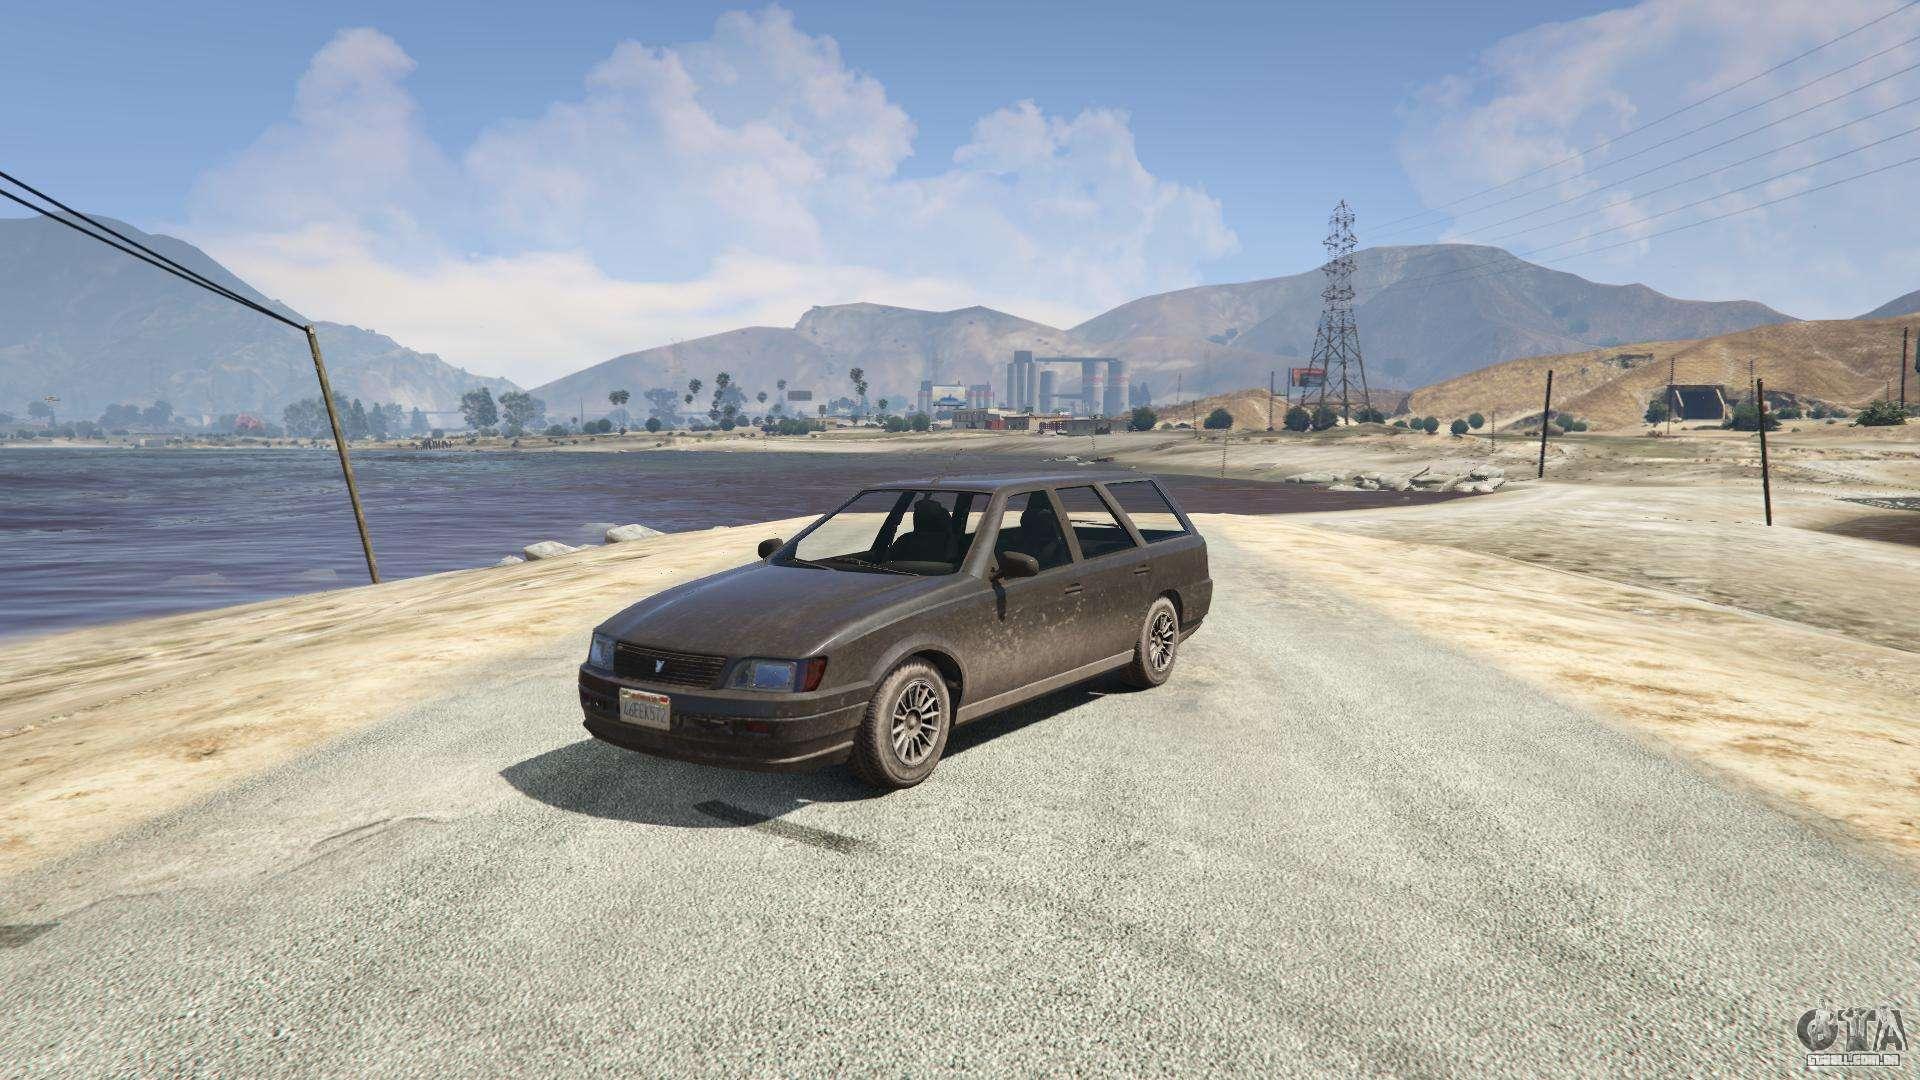 Western Cargobob de GTA 5